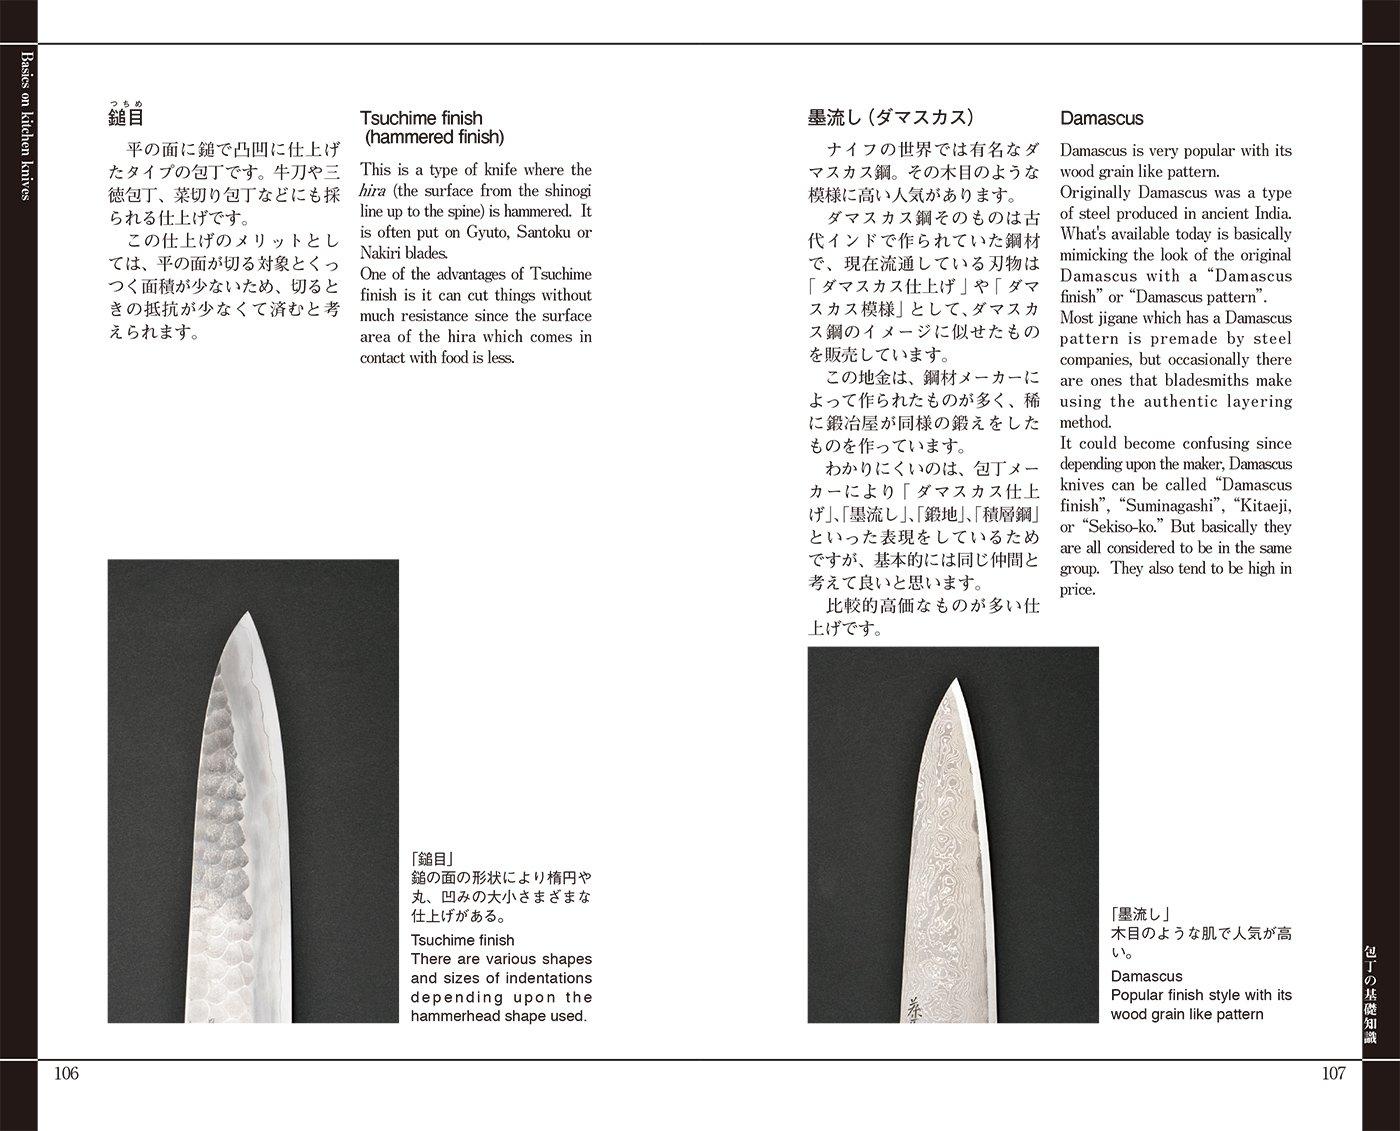 Uncategorized Sharpening Japanese Kitchen Knives japanese knives and sharpening techniques english bilingual books tsukiyama yoshitaka cutlery 9784416615737 amazon com b